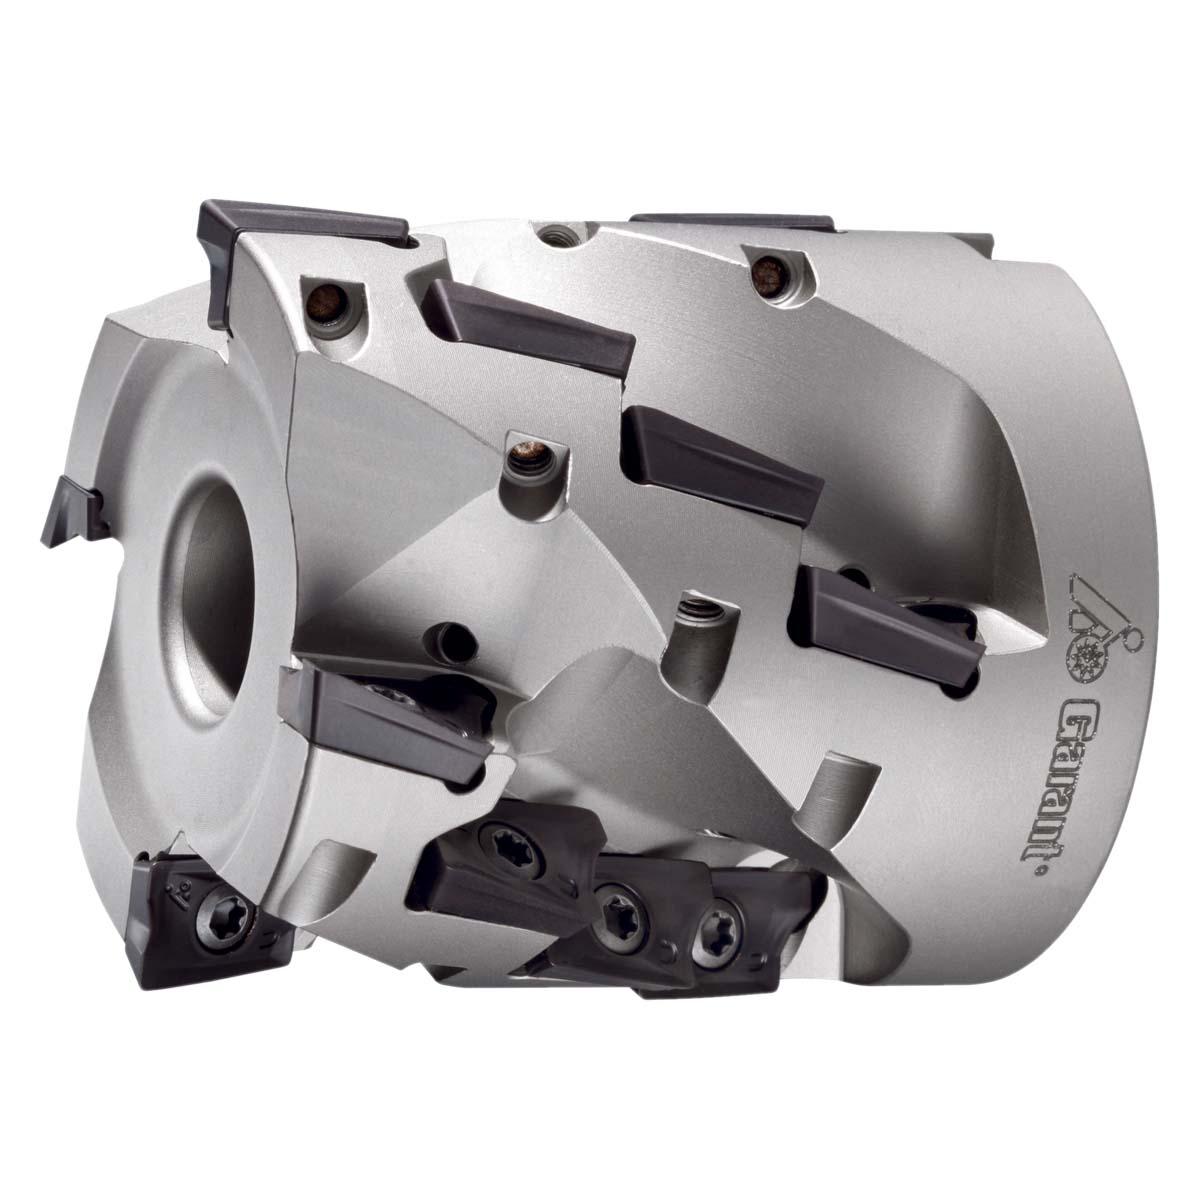 Fresa angular de 90° Softcut® con taladro 50/3 mm GARANT